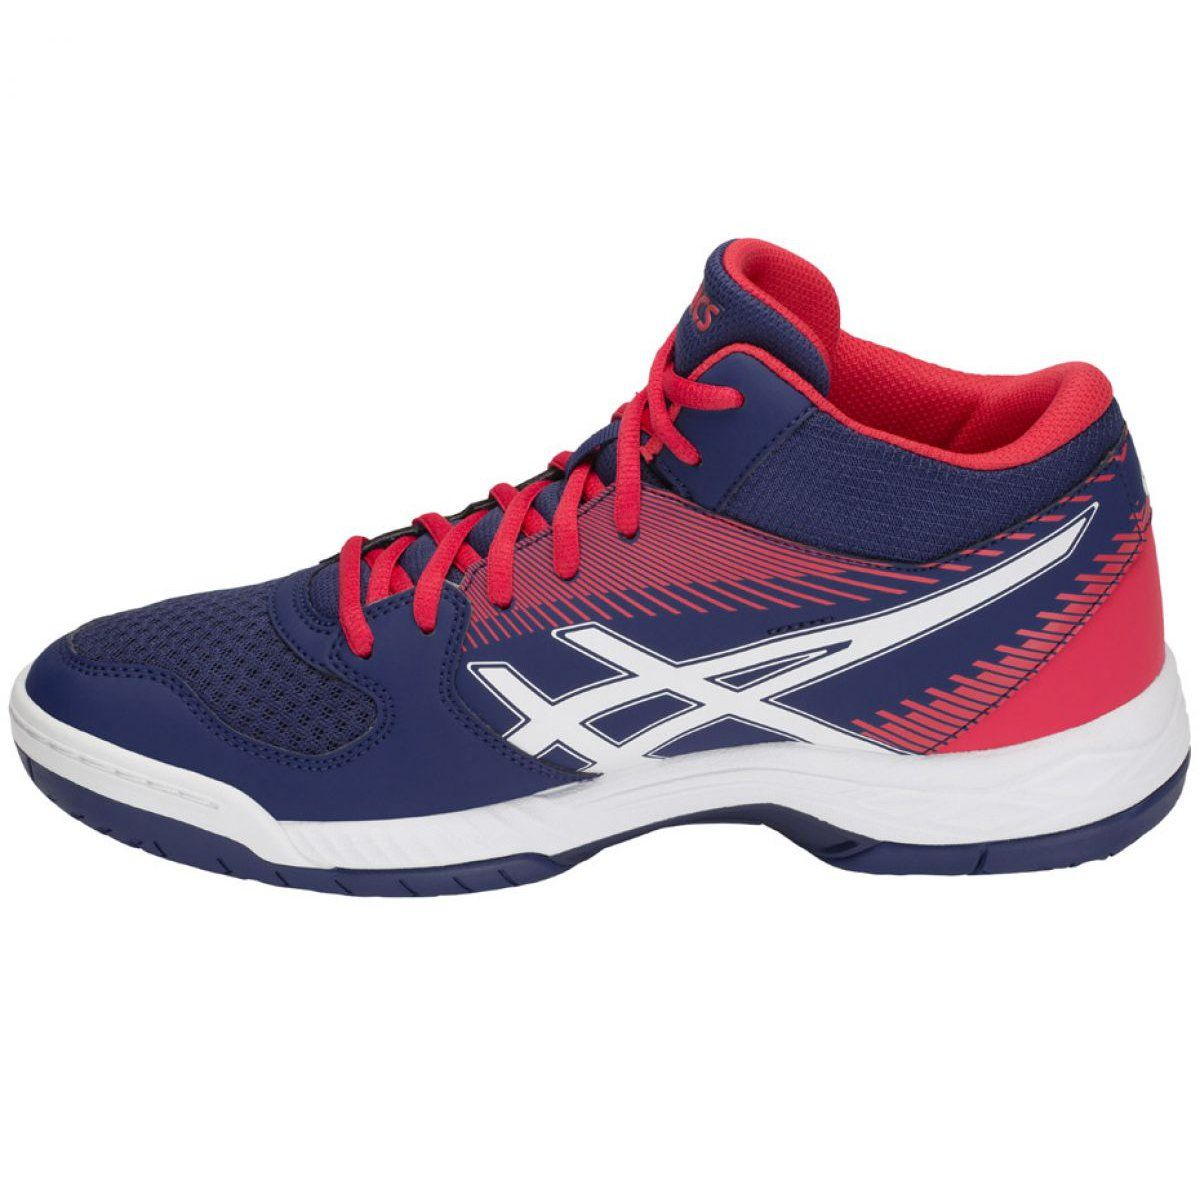 Volleyball Shoes Asics Gel Task Mt M B703y 400 Volleyball Shoes Asics Gel Asics